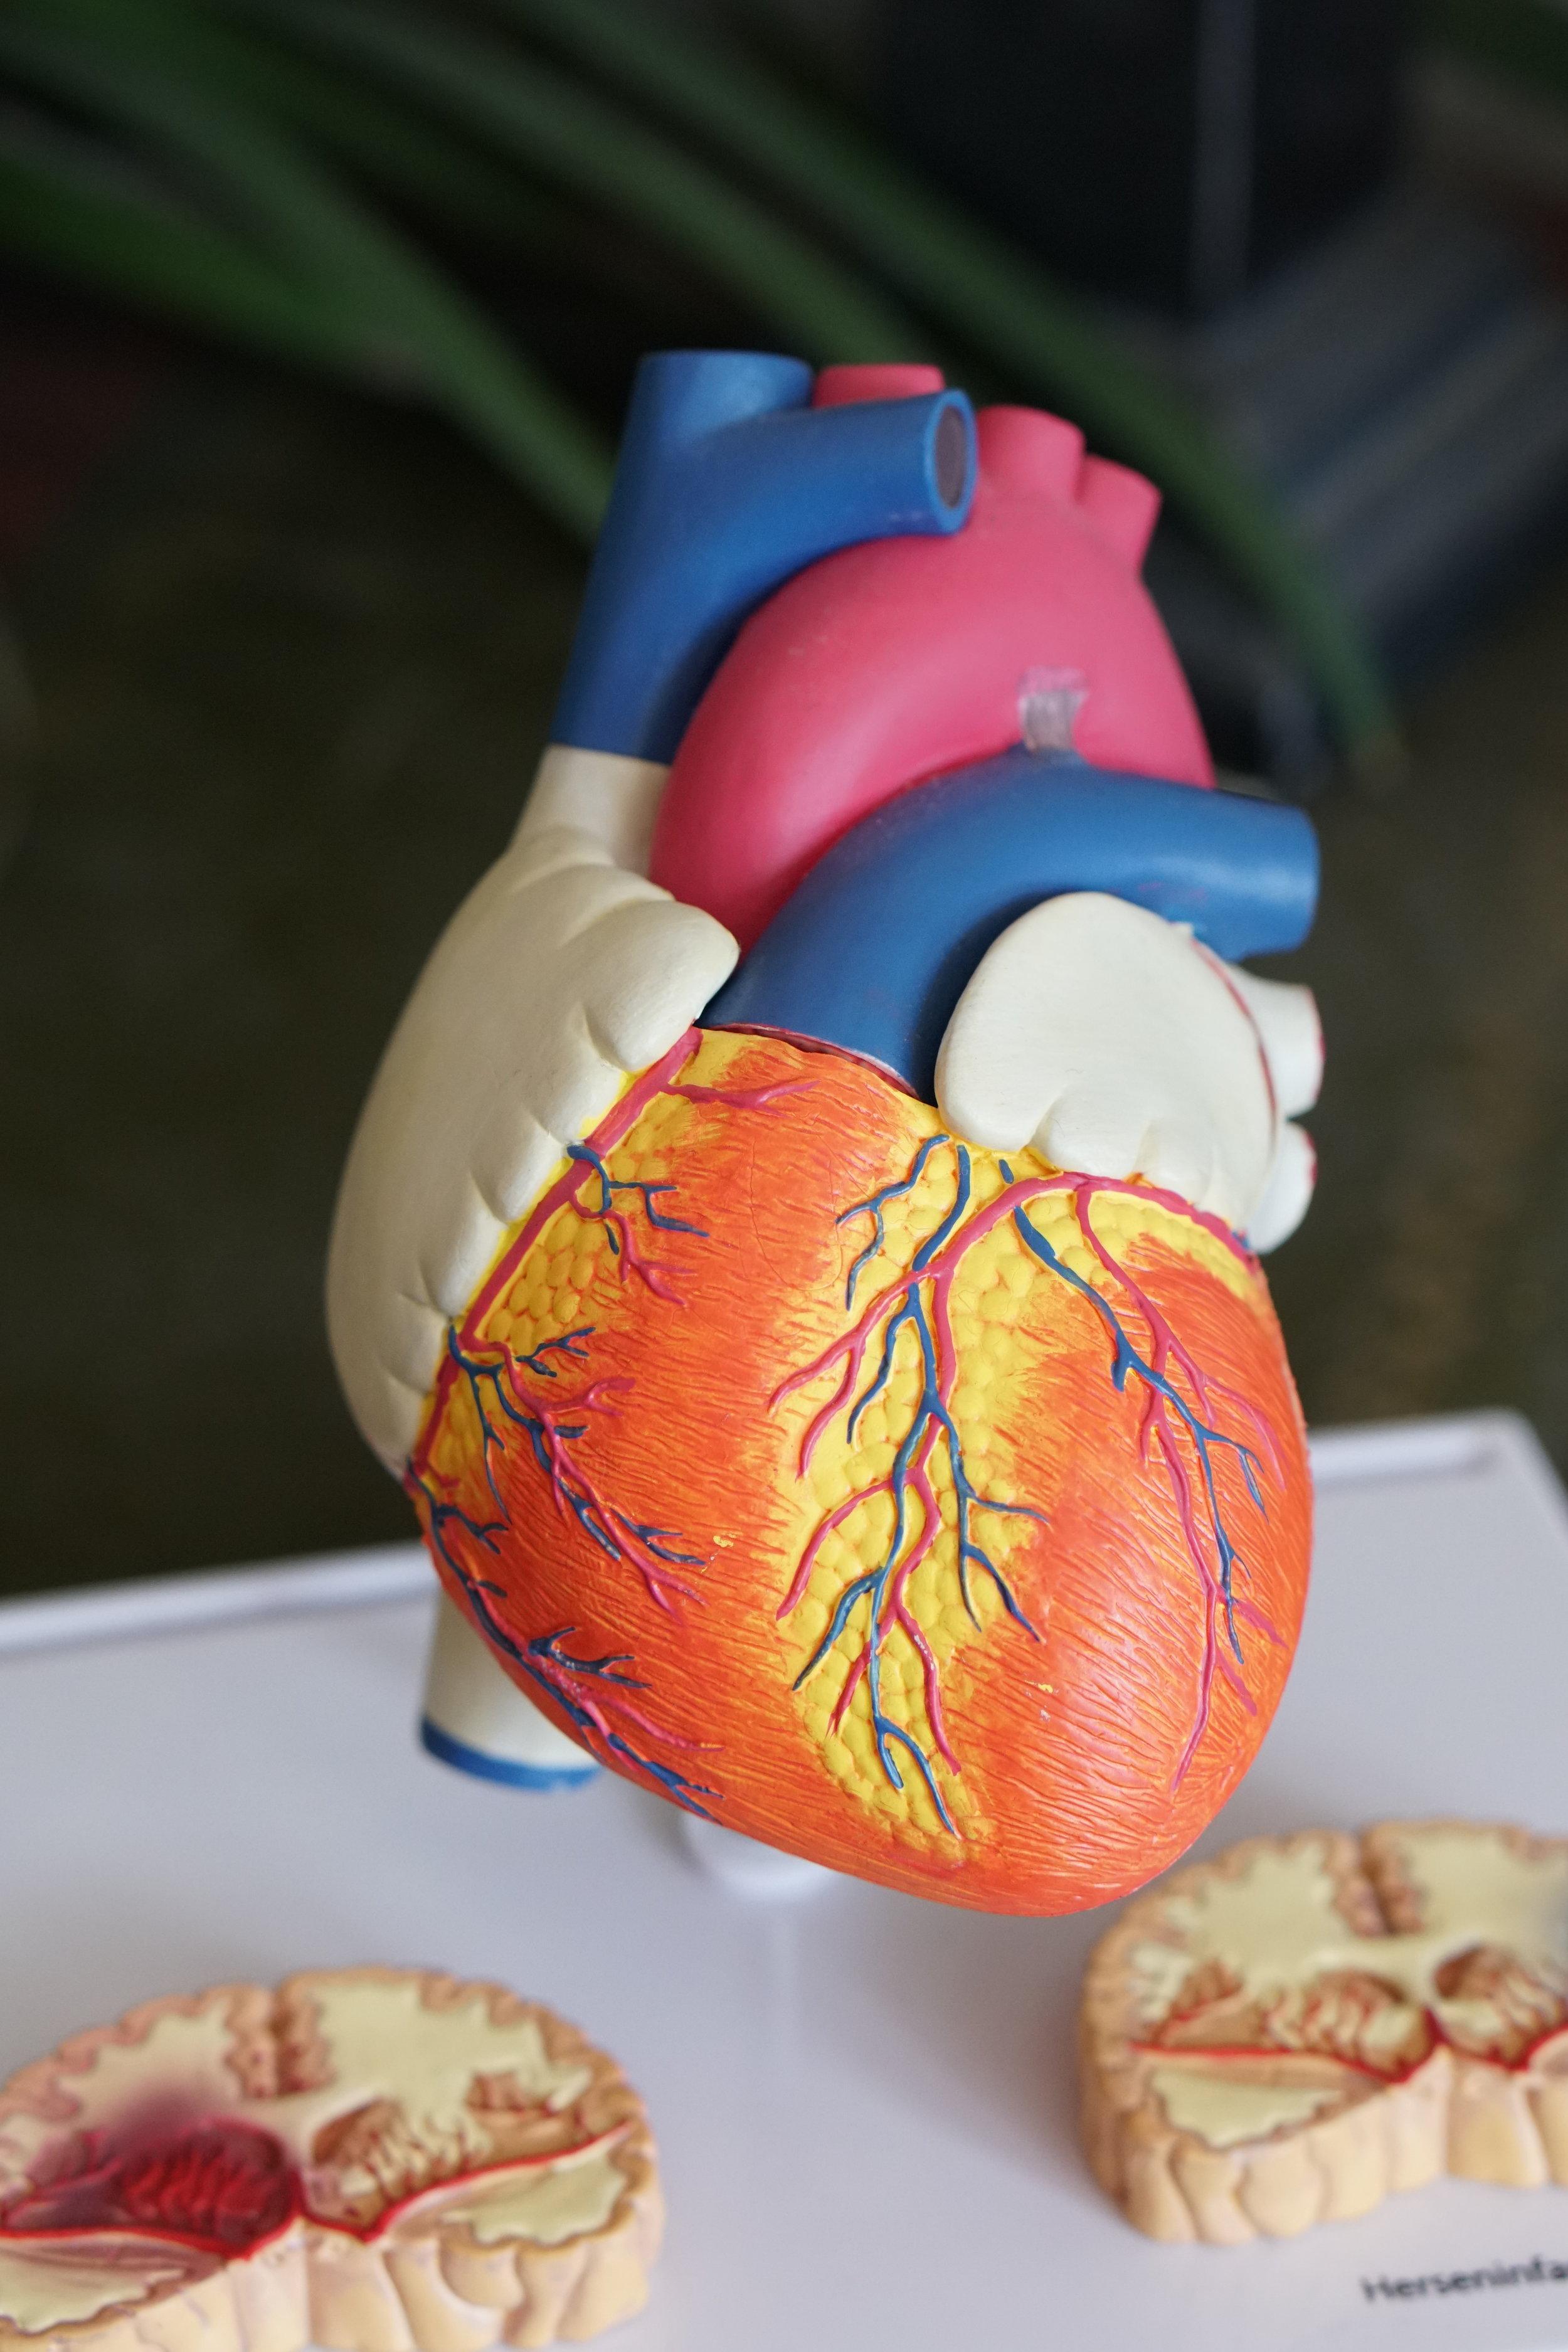 Cardiac Emergencies - Aortic Dissection & Acute Coronary Syndrome